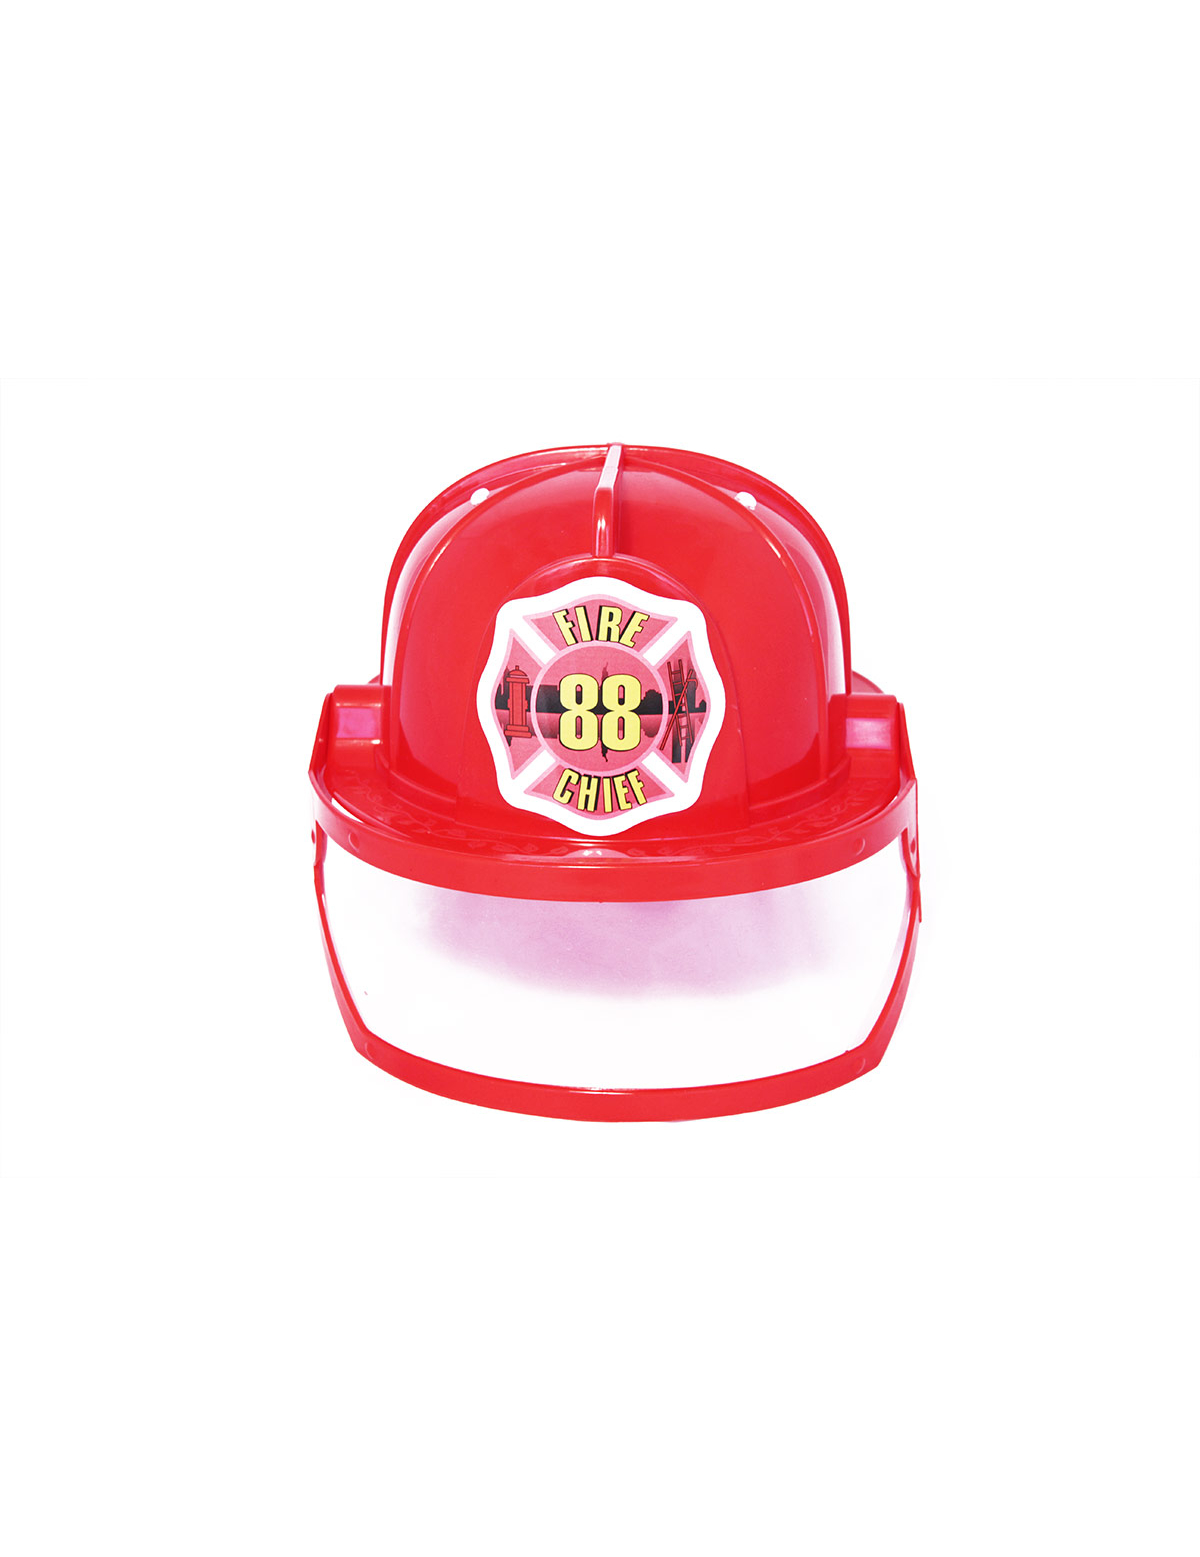 Casco bombero adulto  Sombreros c0da9c3410d